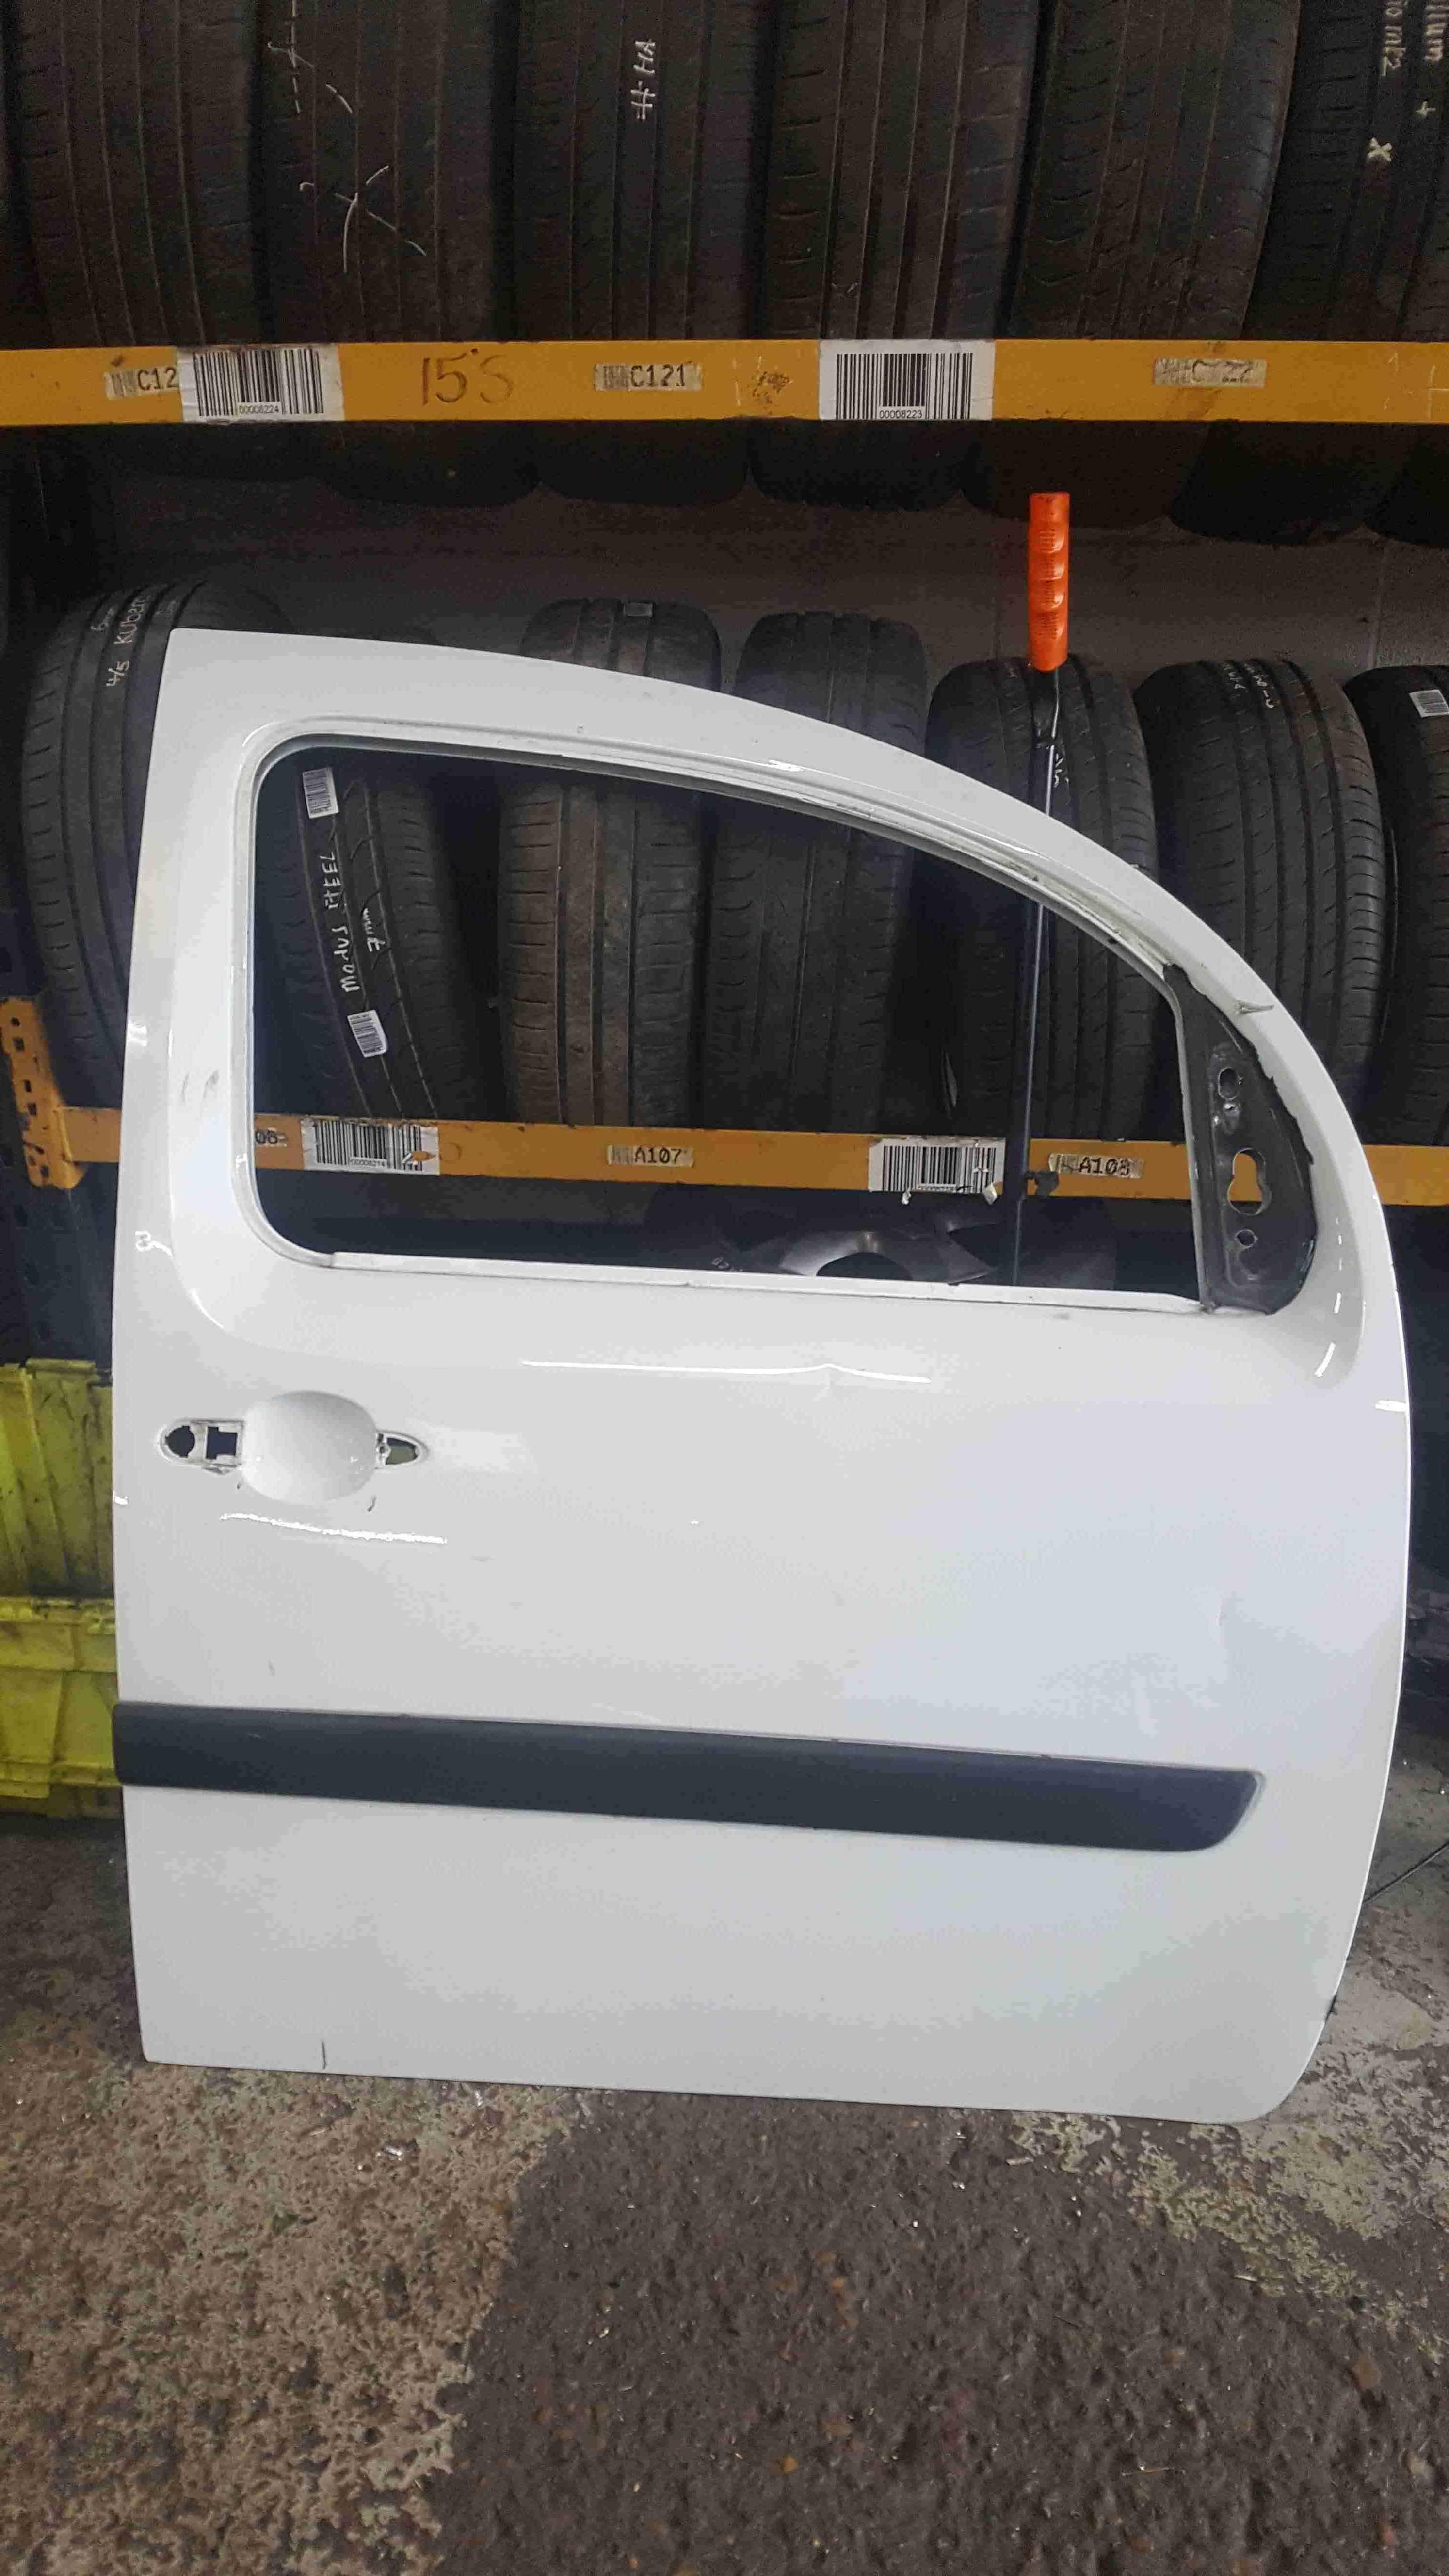 Renault Kangoo 2007-2017 Drivers OSF Front White Door O369 0369